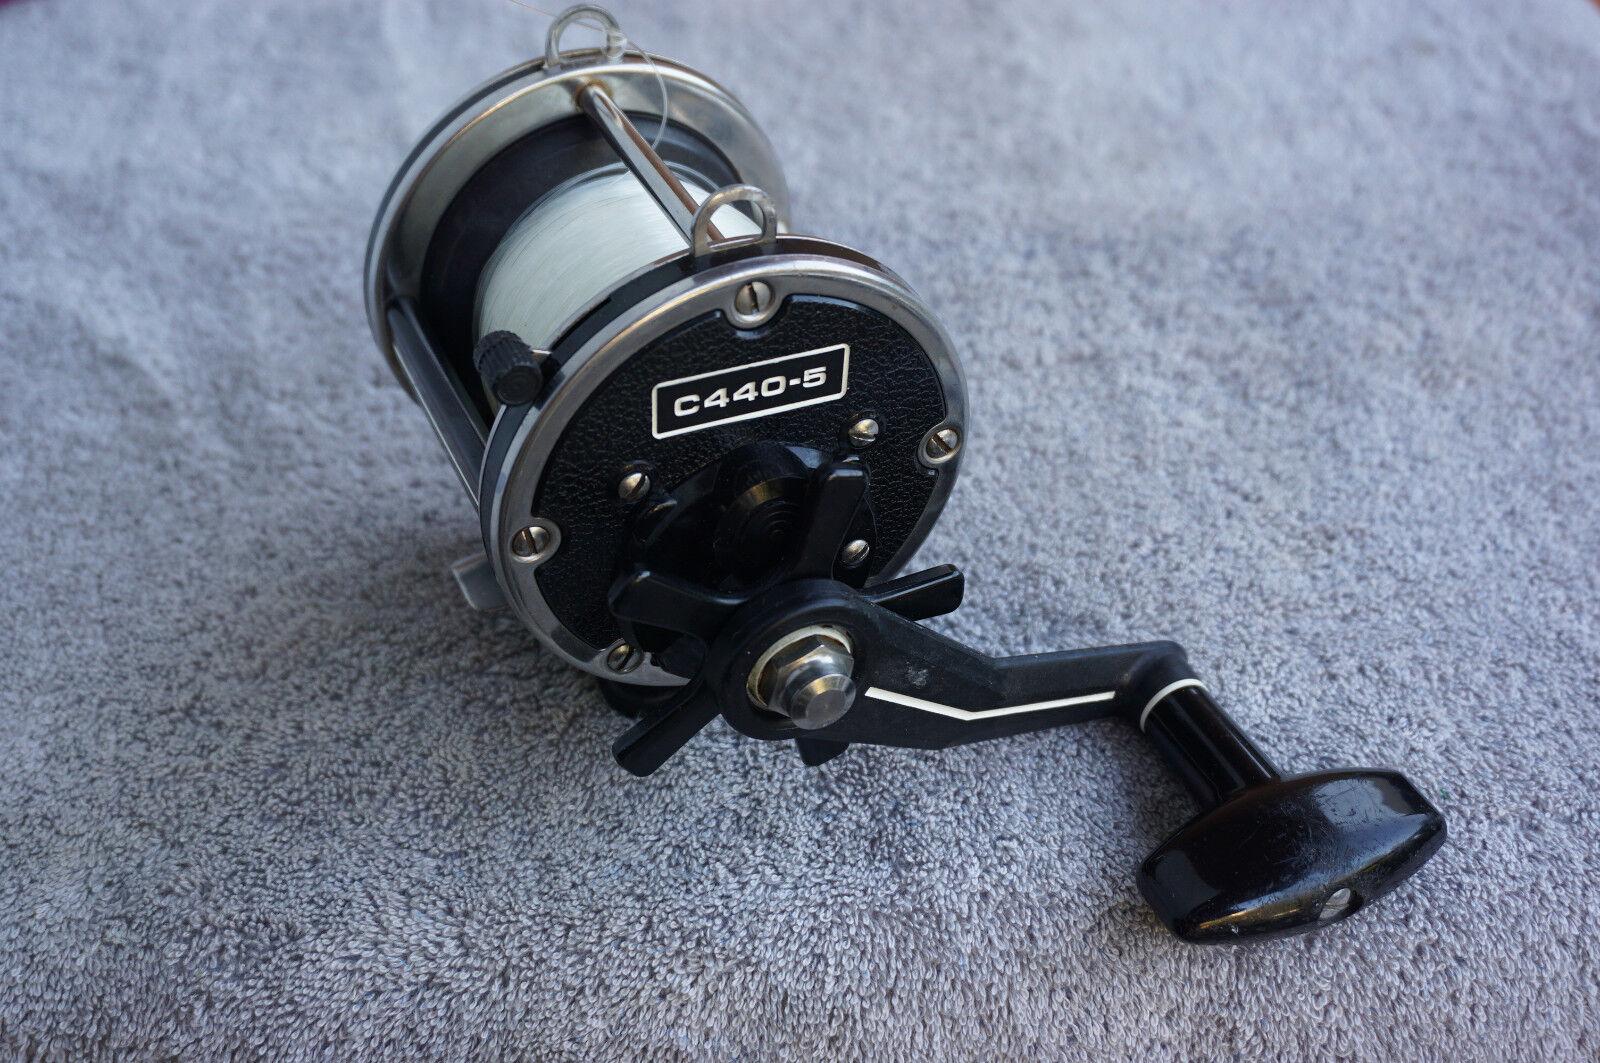 NEWELL C4405 FISHING CASTING REEL